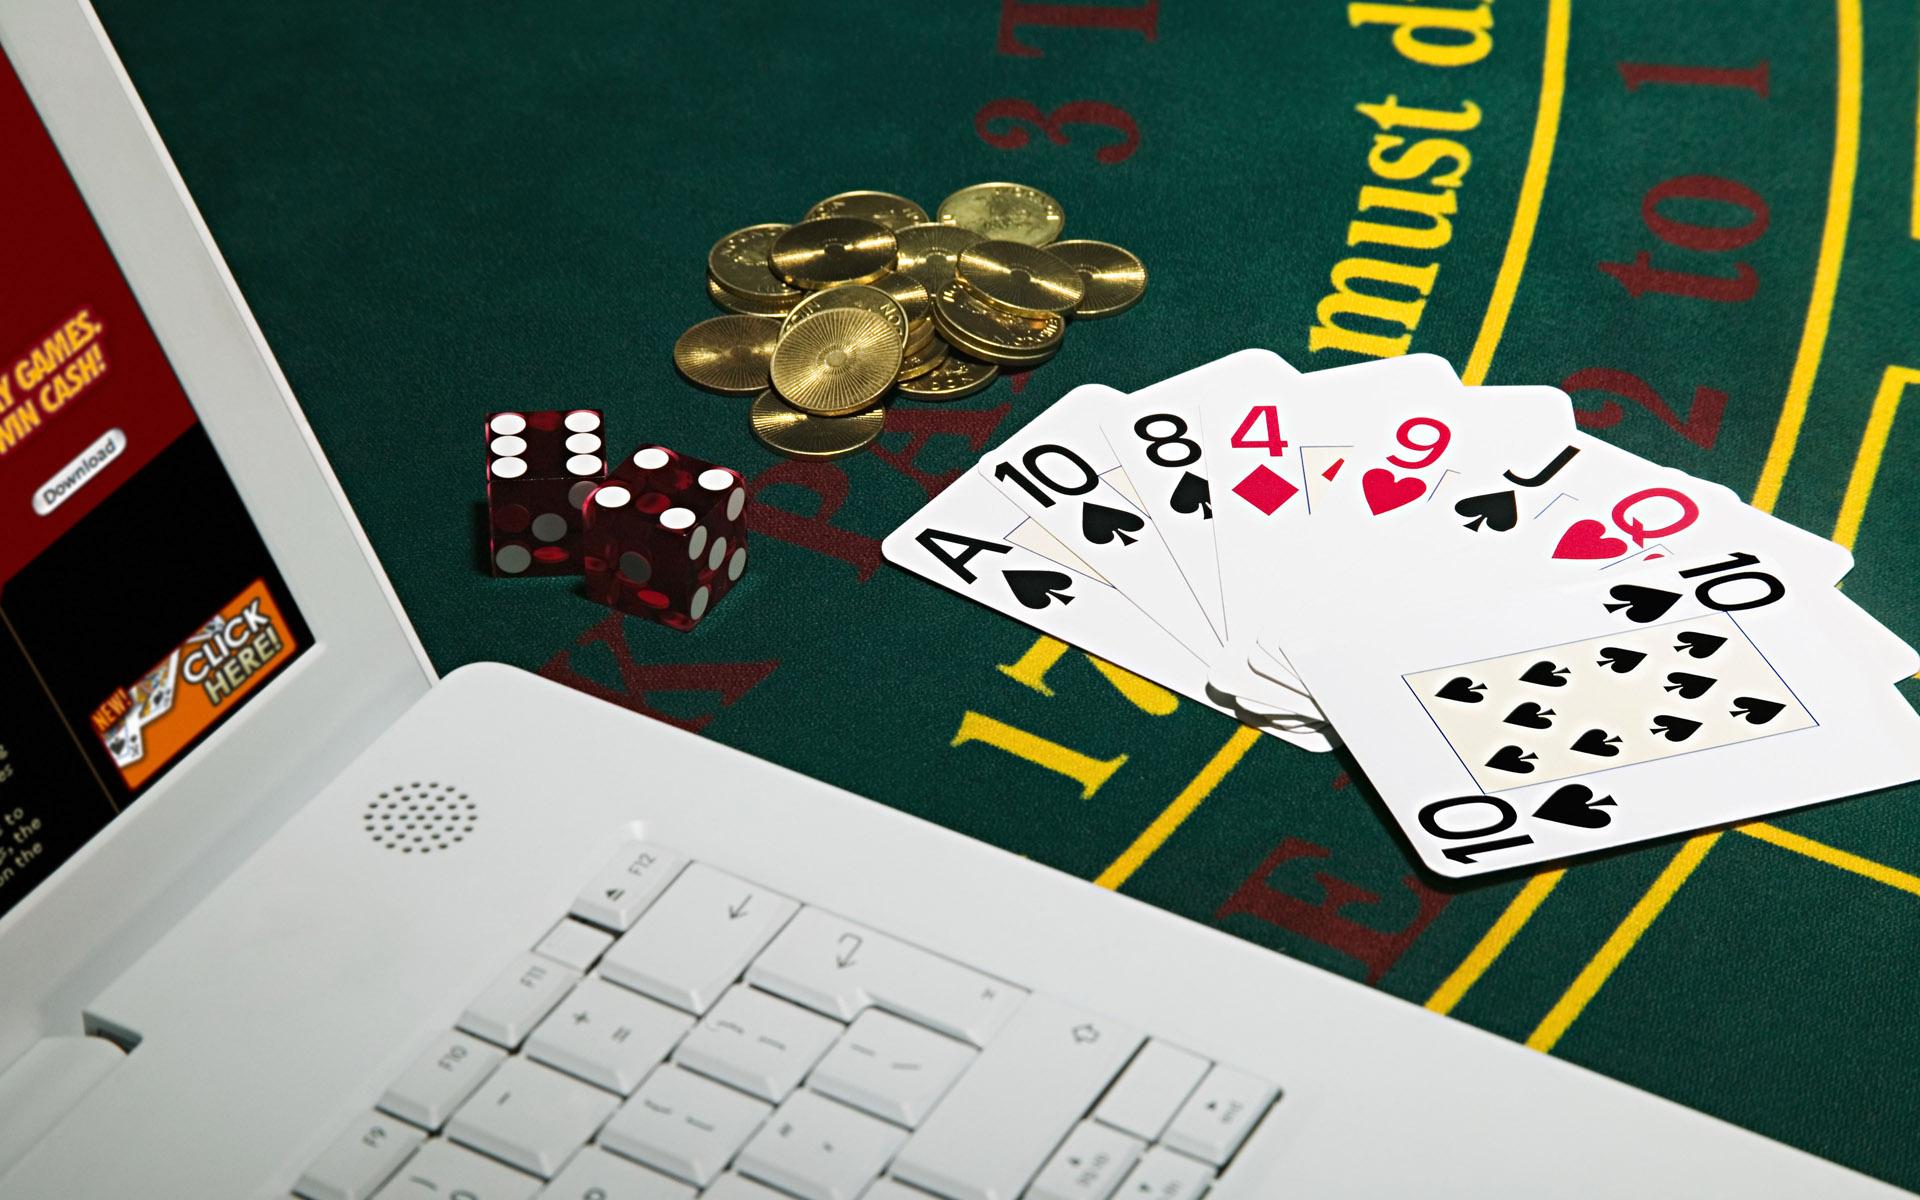 Почему так популярны онлайн казино «Zoloto Loto»?